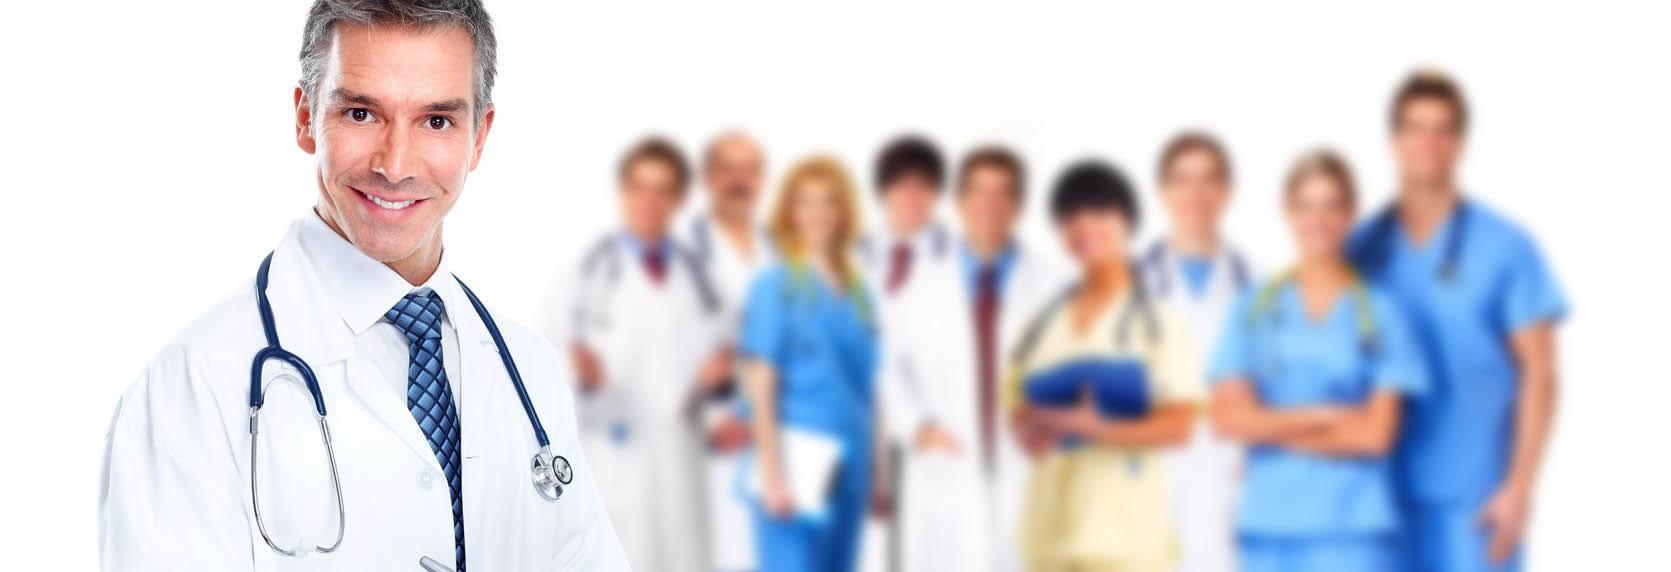 medical health group photo